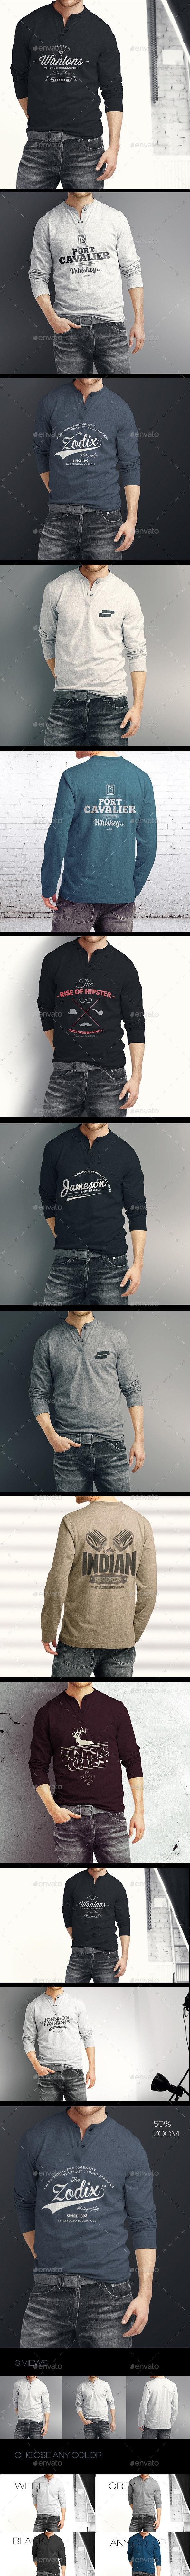 Man Longsleeve Shirt Mock-up - T-shirts Apparel